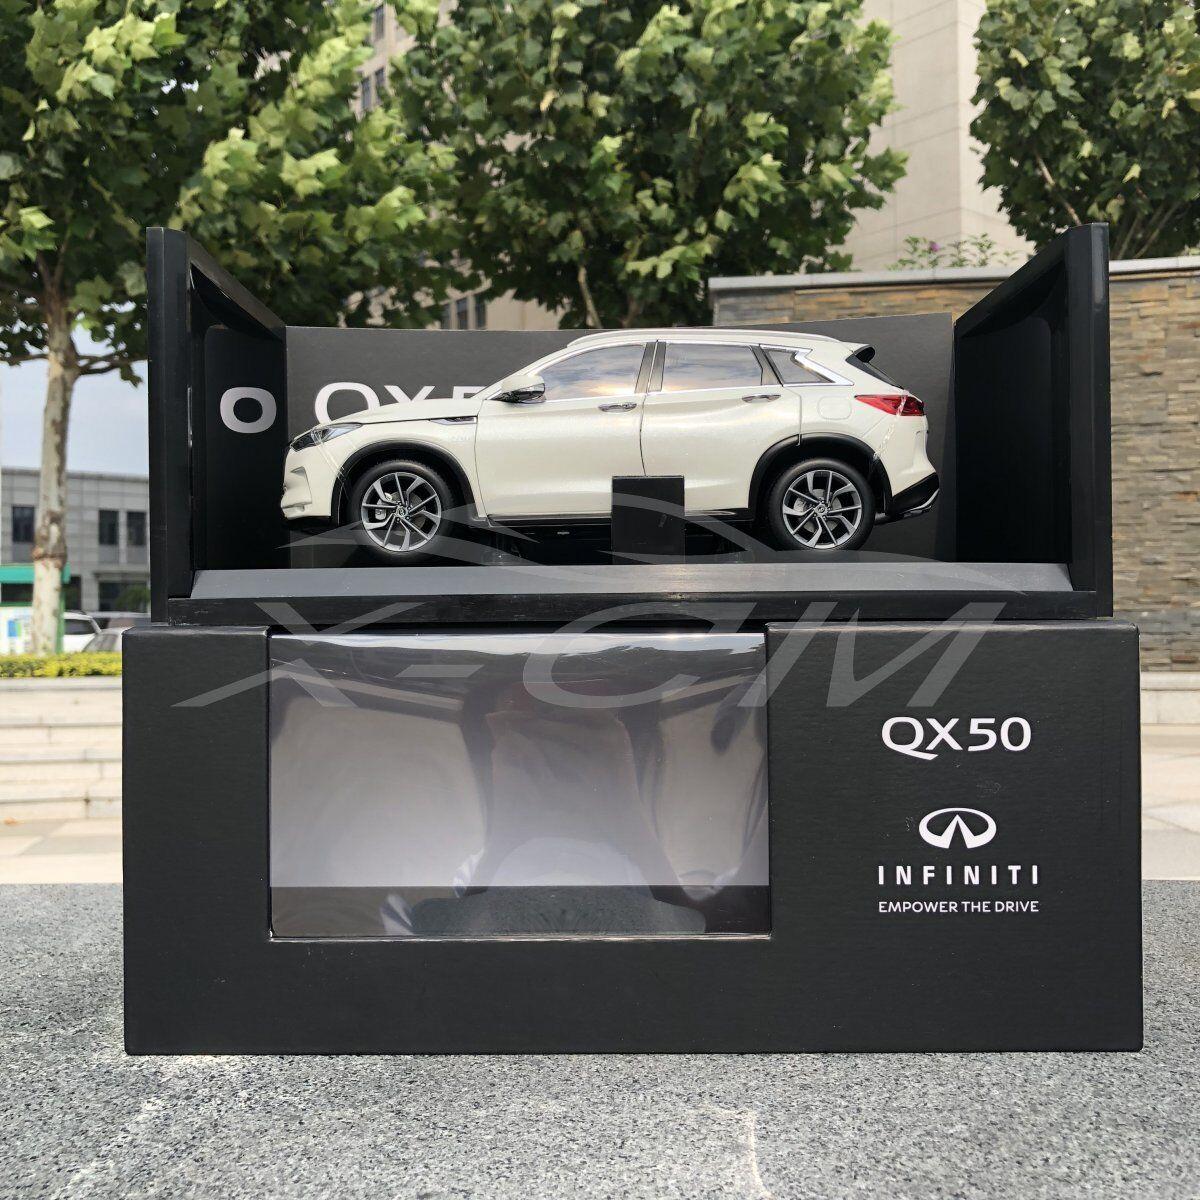 Modello AUTO DIECAST KENG fai Dong Feng INFINITI NUOVO QX50 1 18 (bianco) + REGALO